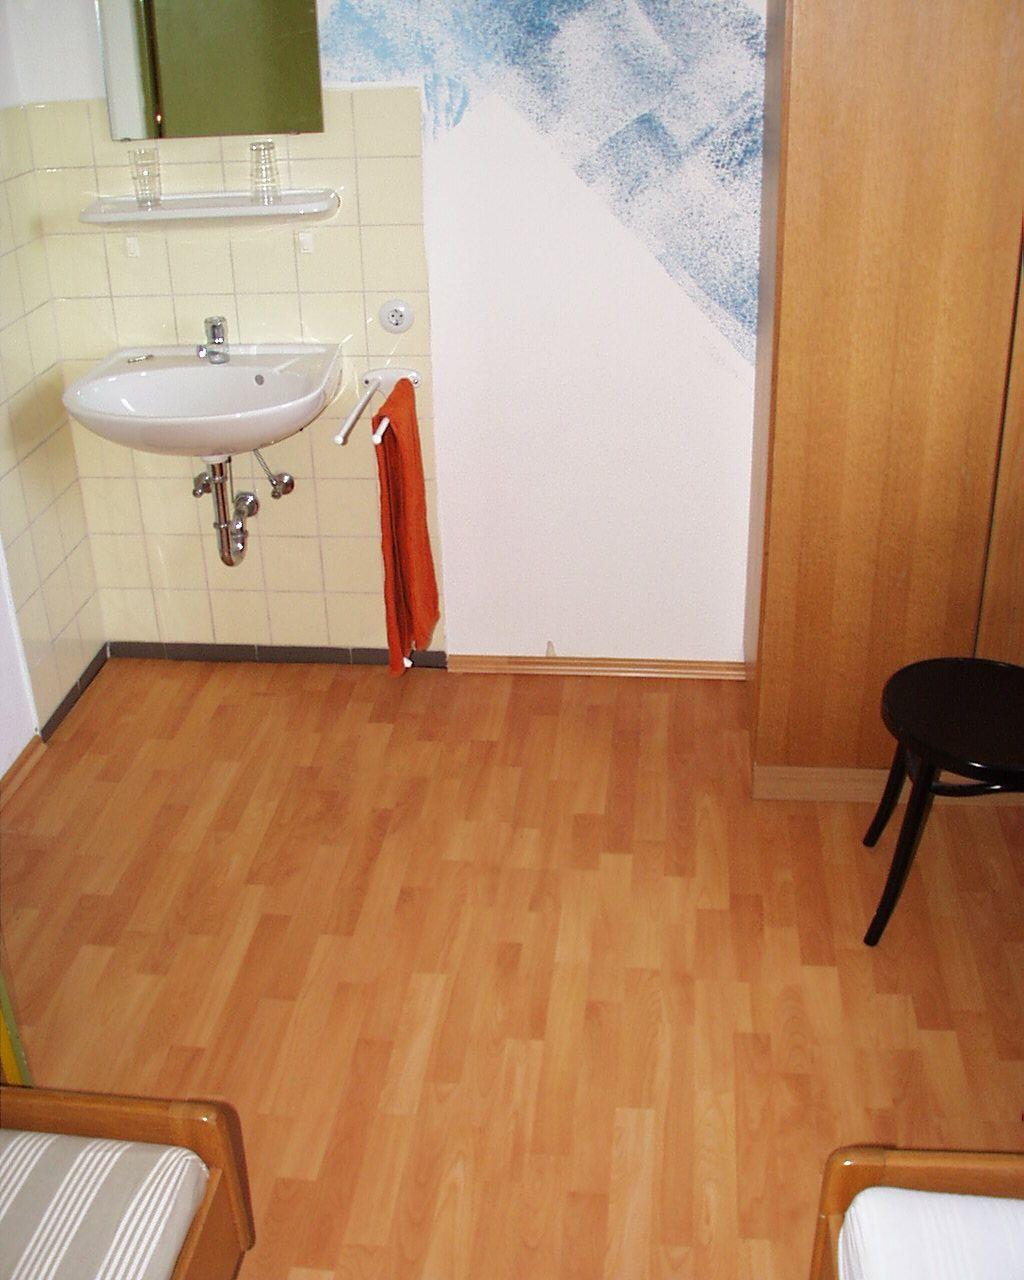 laminat im flur verlegen awesome finden sie den idealen flurboden with laminat im flur verlegen. Black Bedroom Furniture Sets. Home Design Ideas